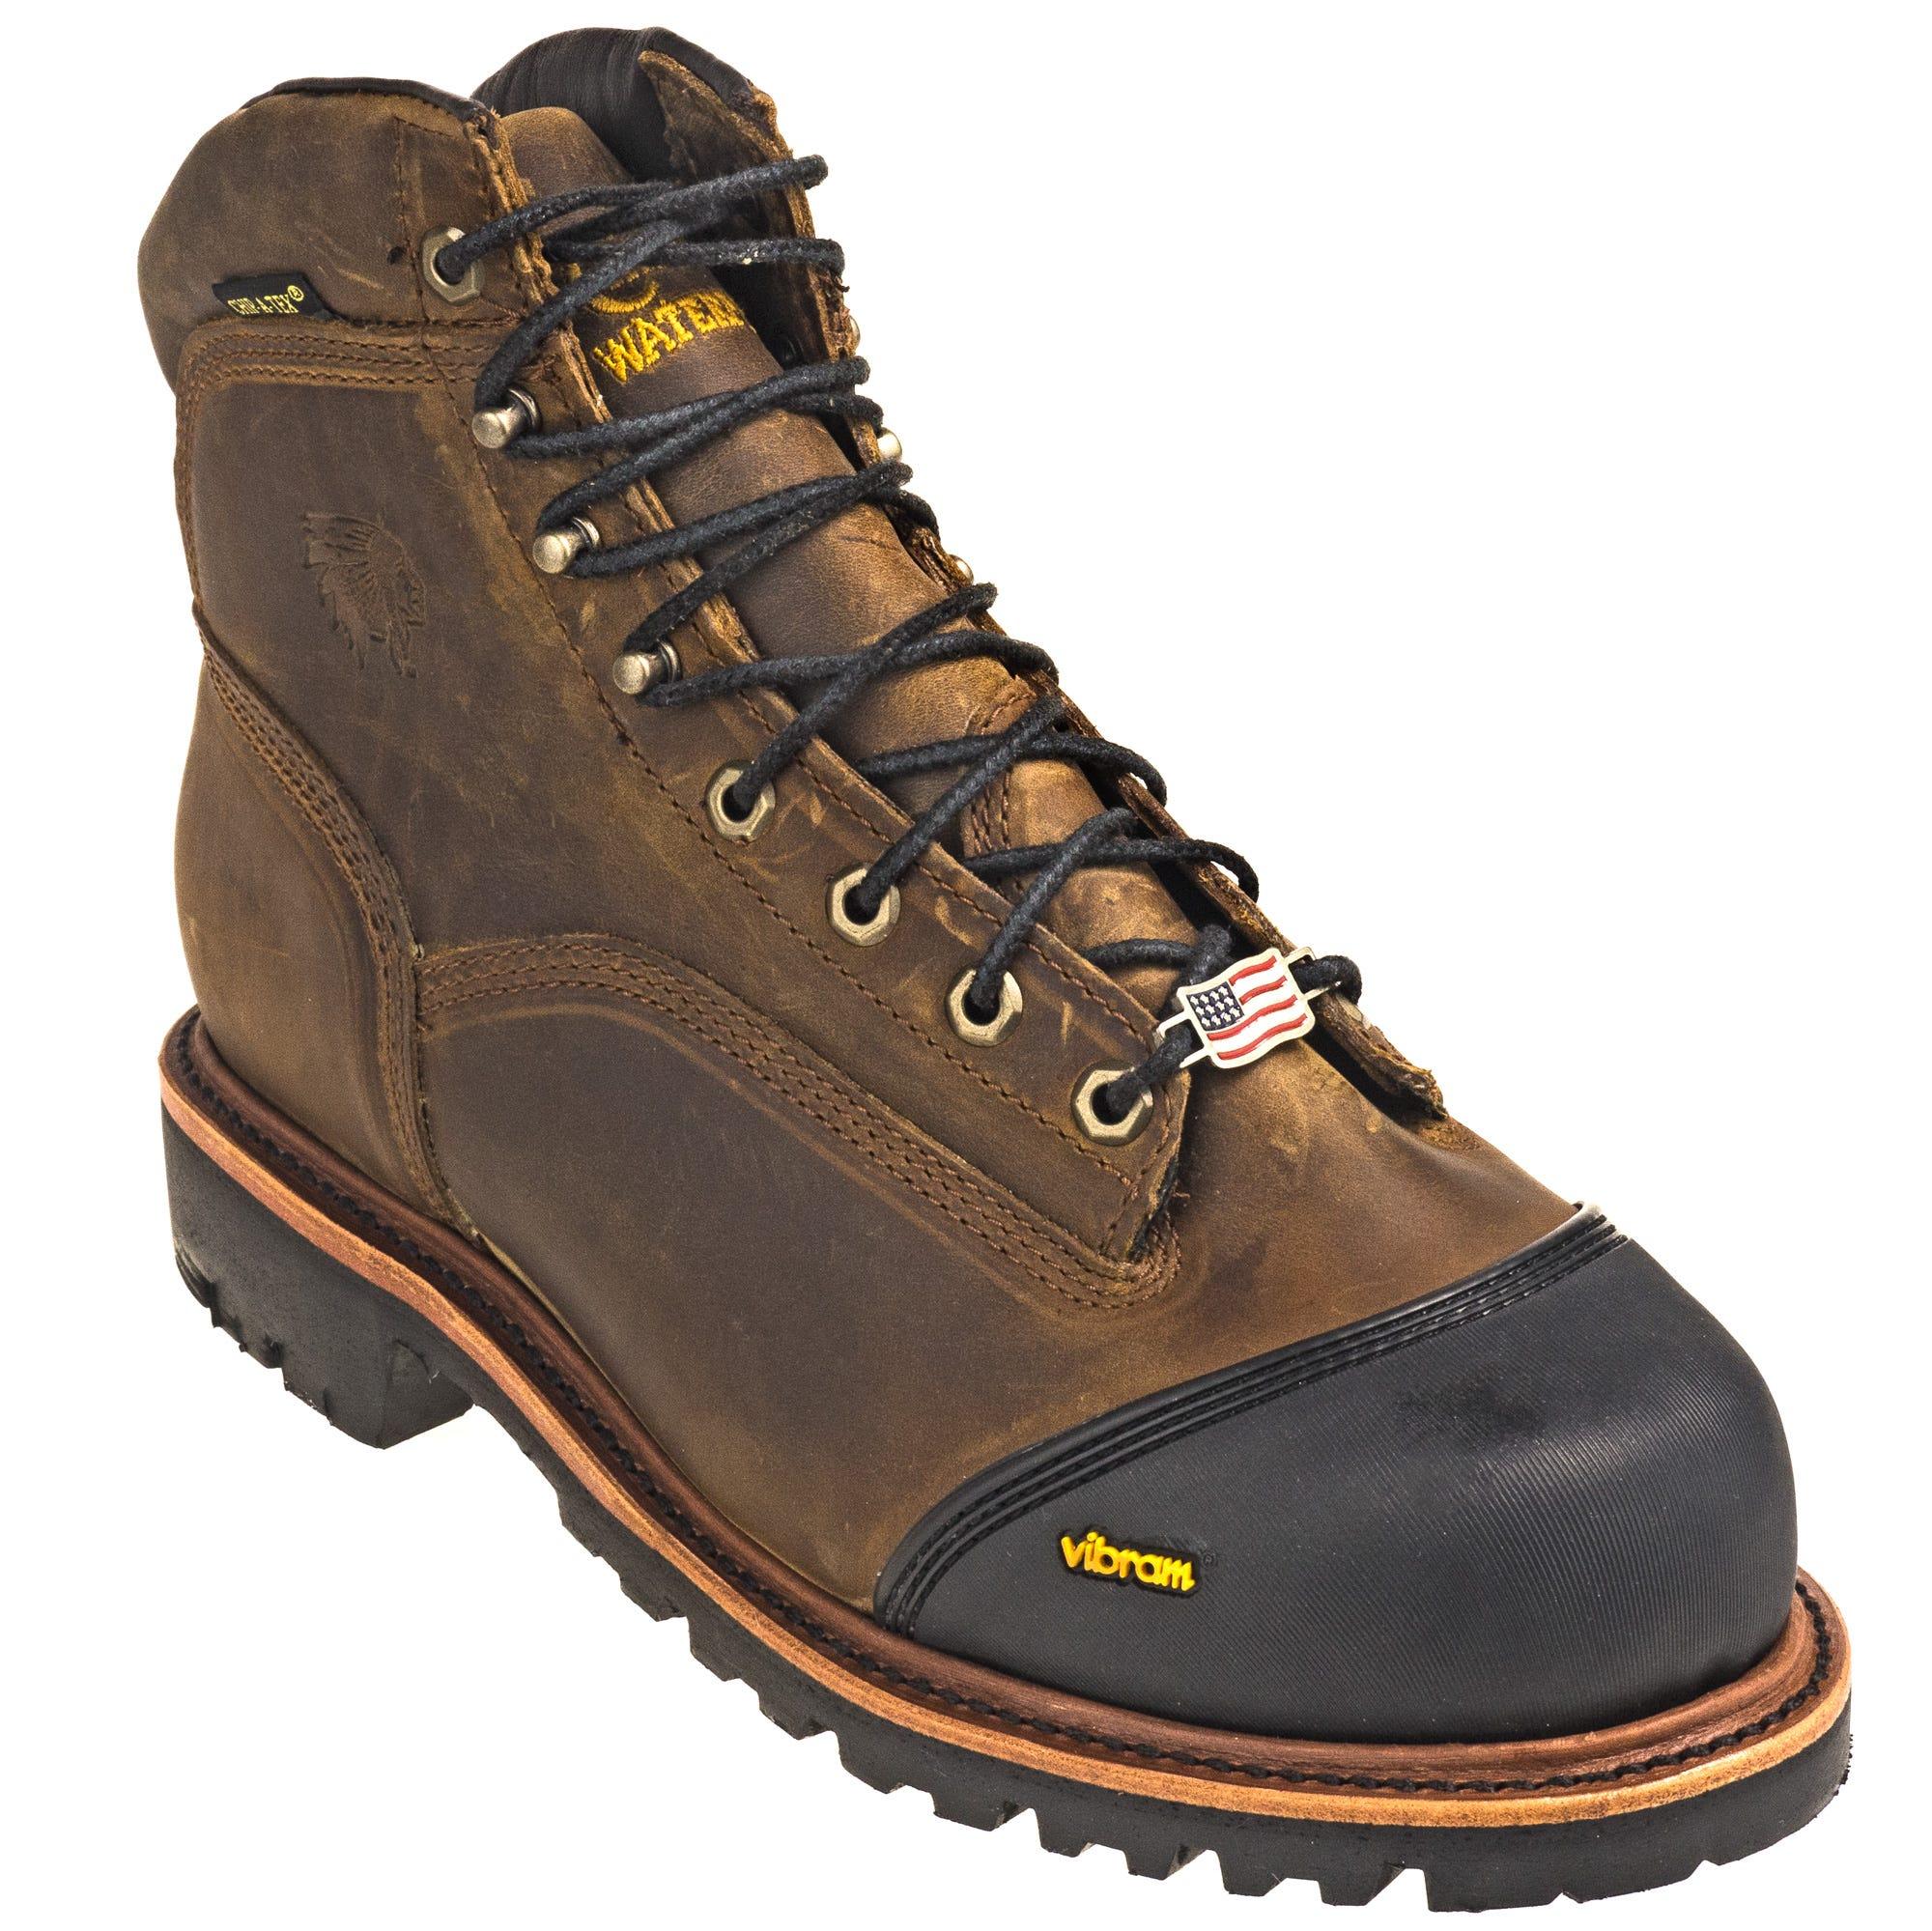 2fc03ecc22f Chippewa Boots: Waterproof Men's 25371 Brown Composite Toe EH Super ...